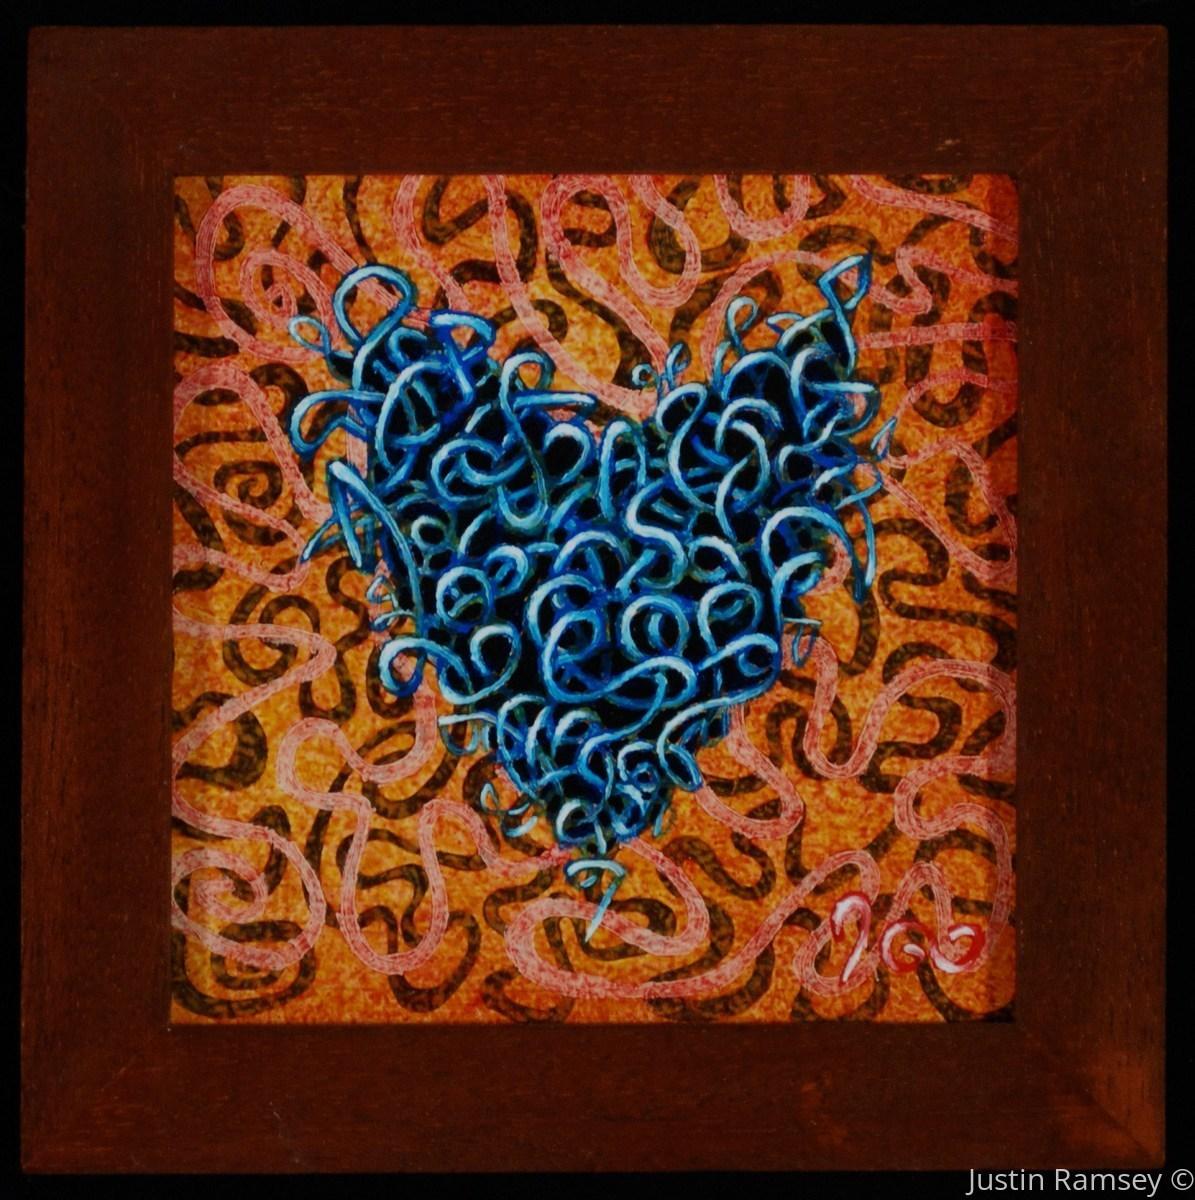 Blue Ribbon Heart (large view)